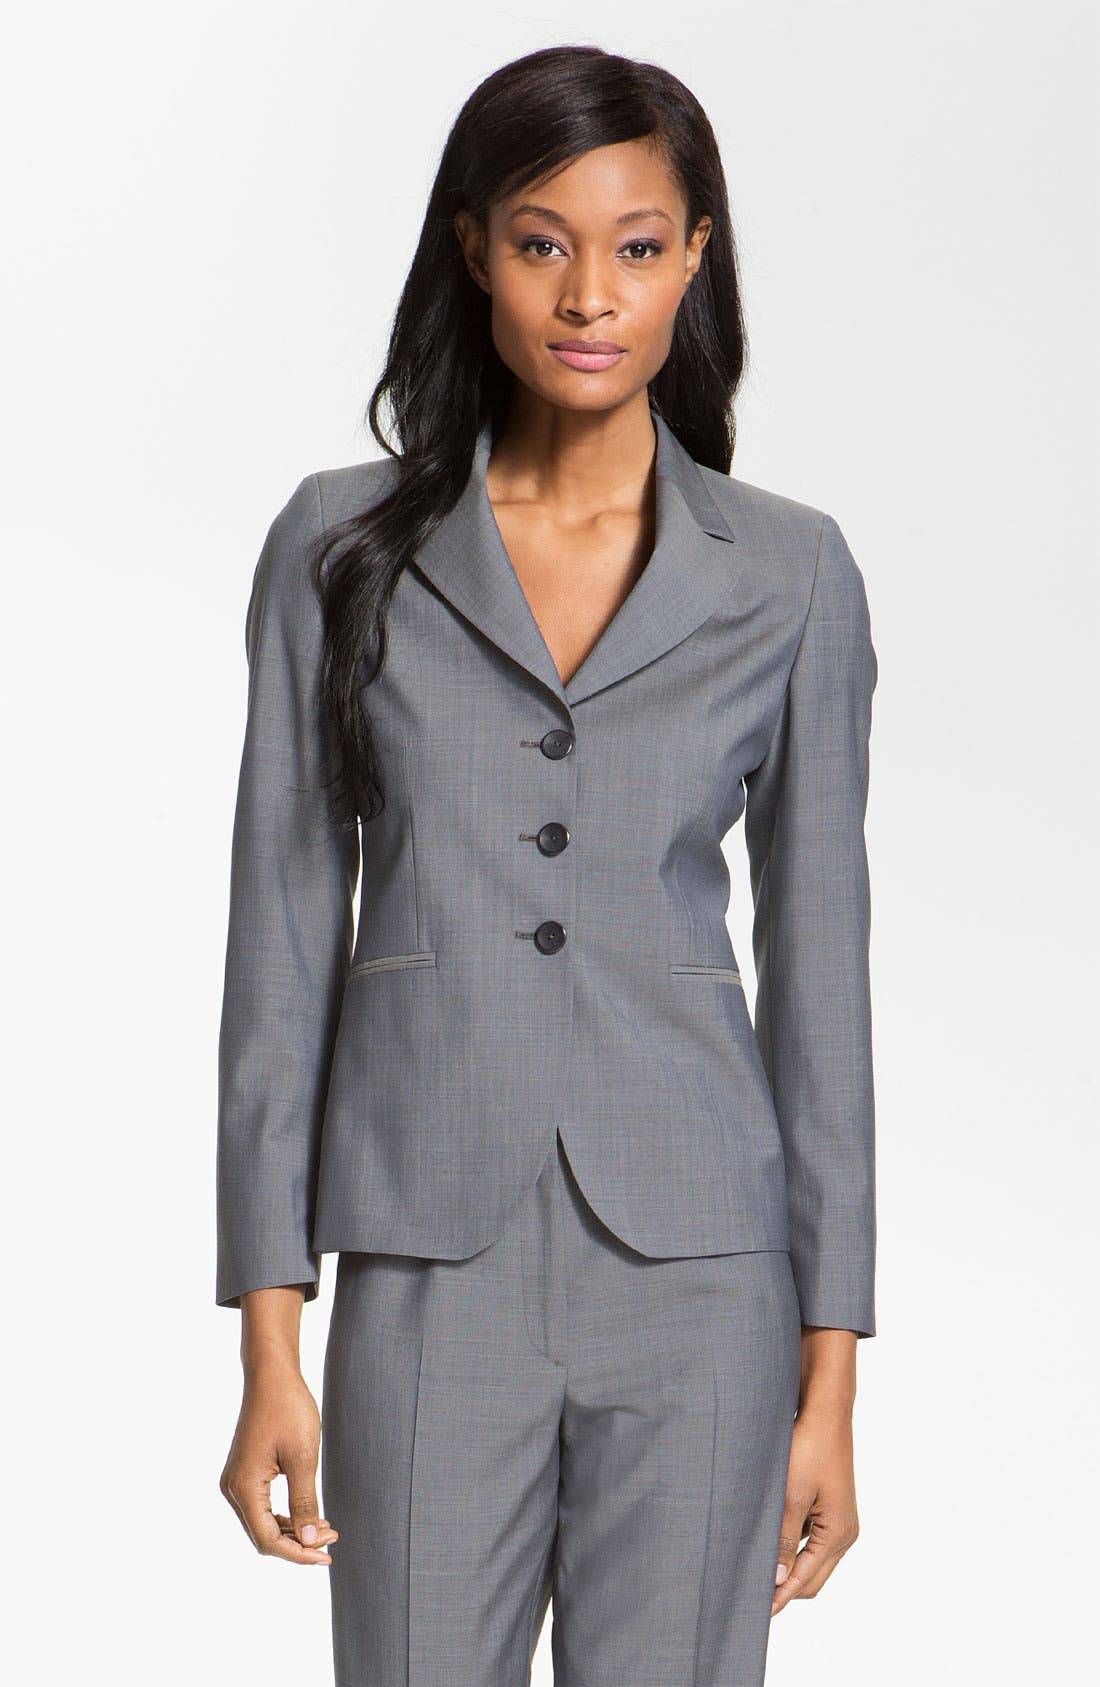 Alternate Image 1 Selected - Zanella 'Tracy' Suit Jacket